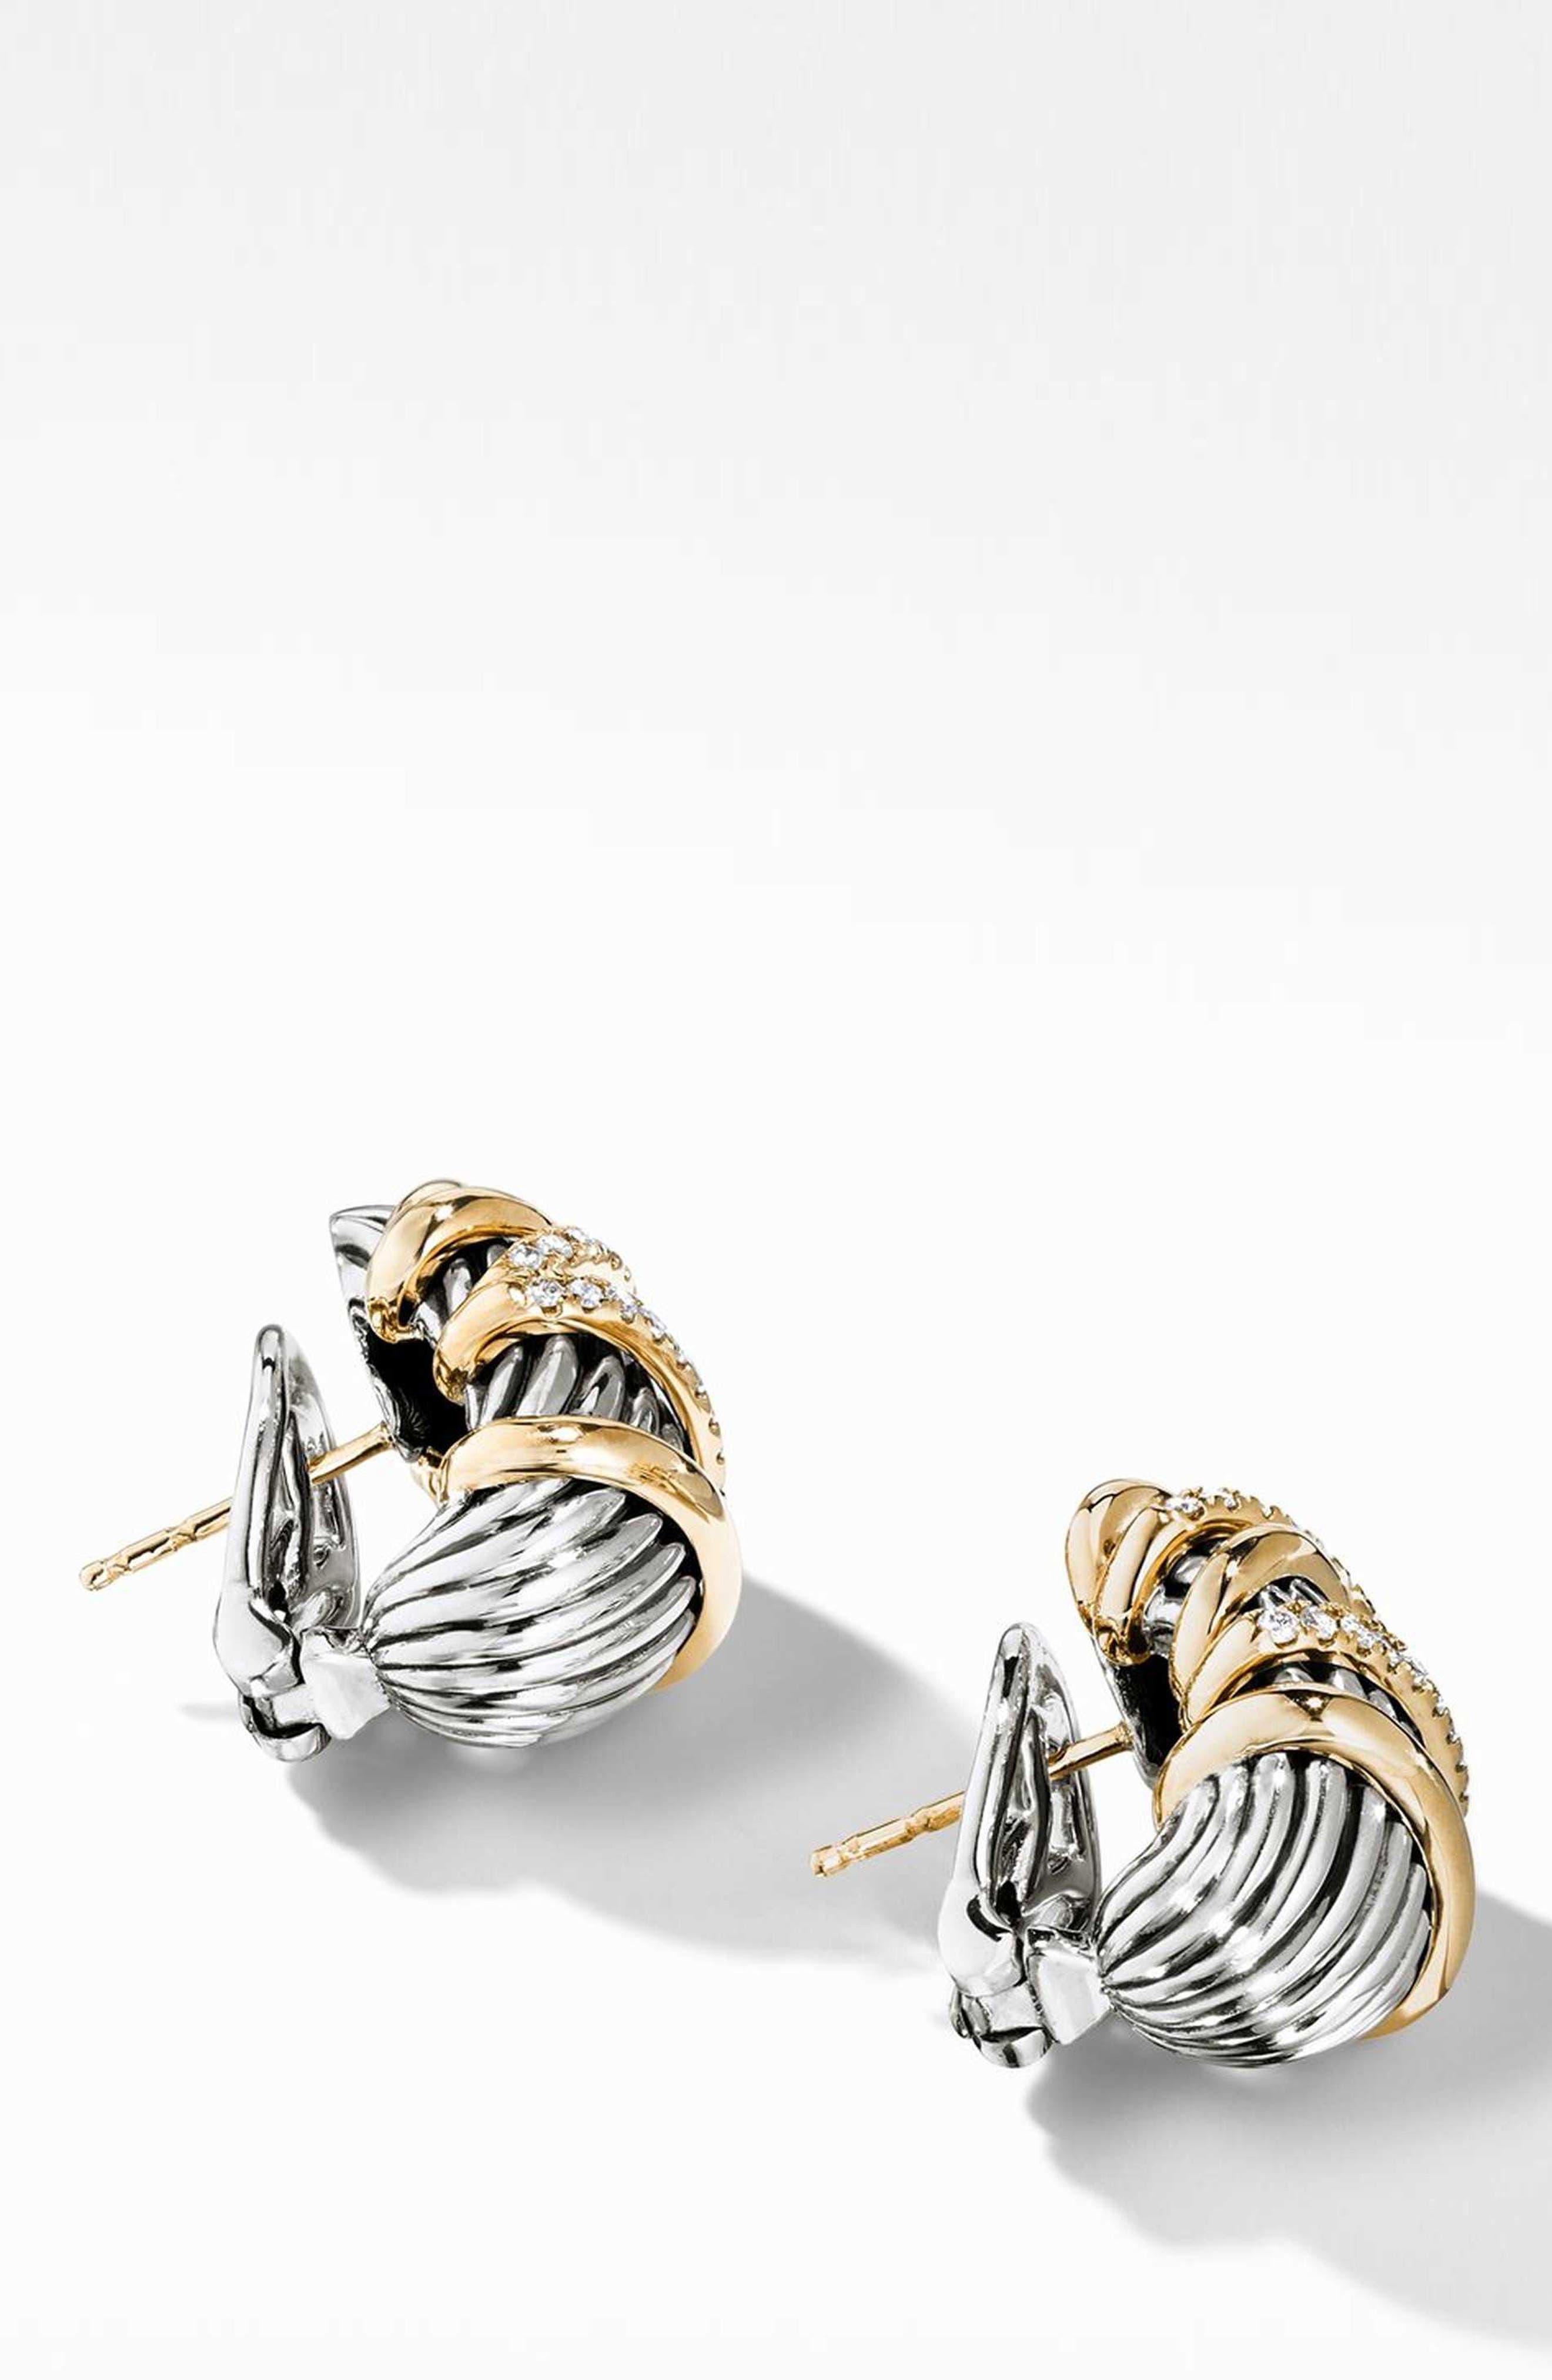 DAVID YURMAN, Helena Shrimp Earrings with 18K Gold and Diamonds, Main thumbnail 1, color, GOLD/ SILVER/ DIAMOND